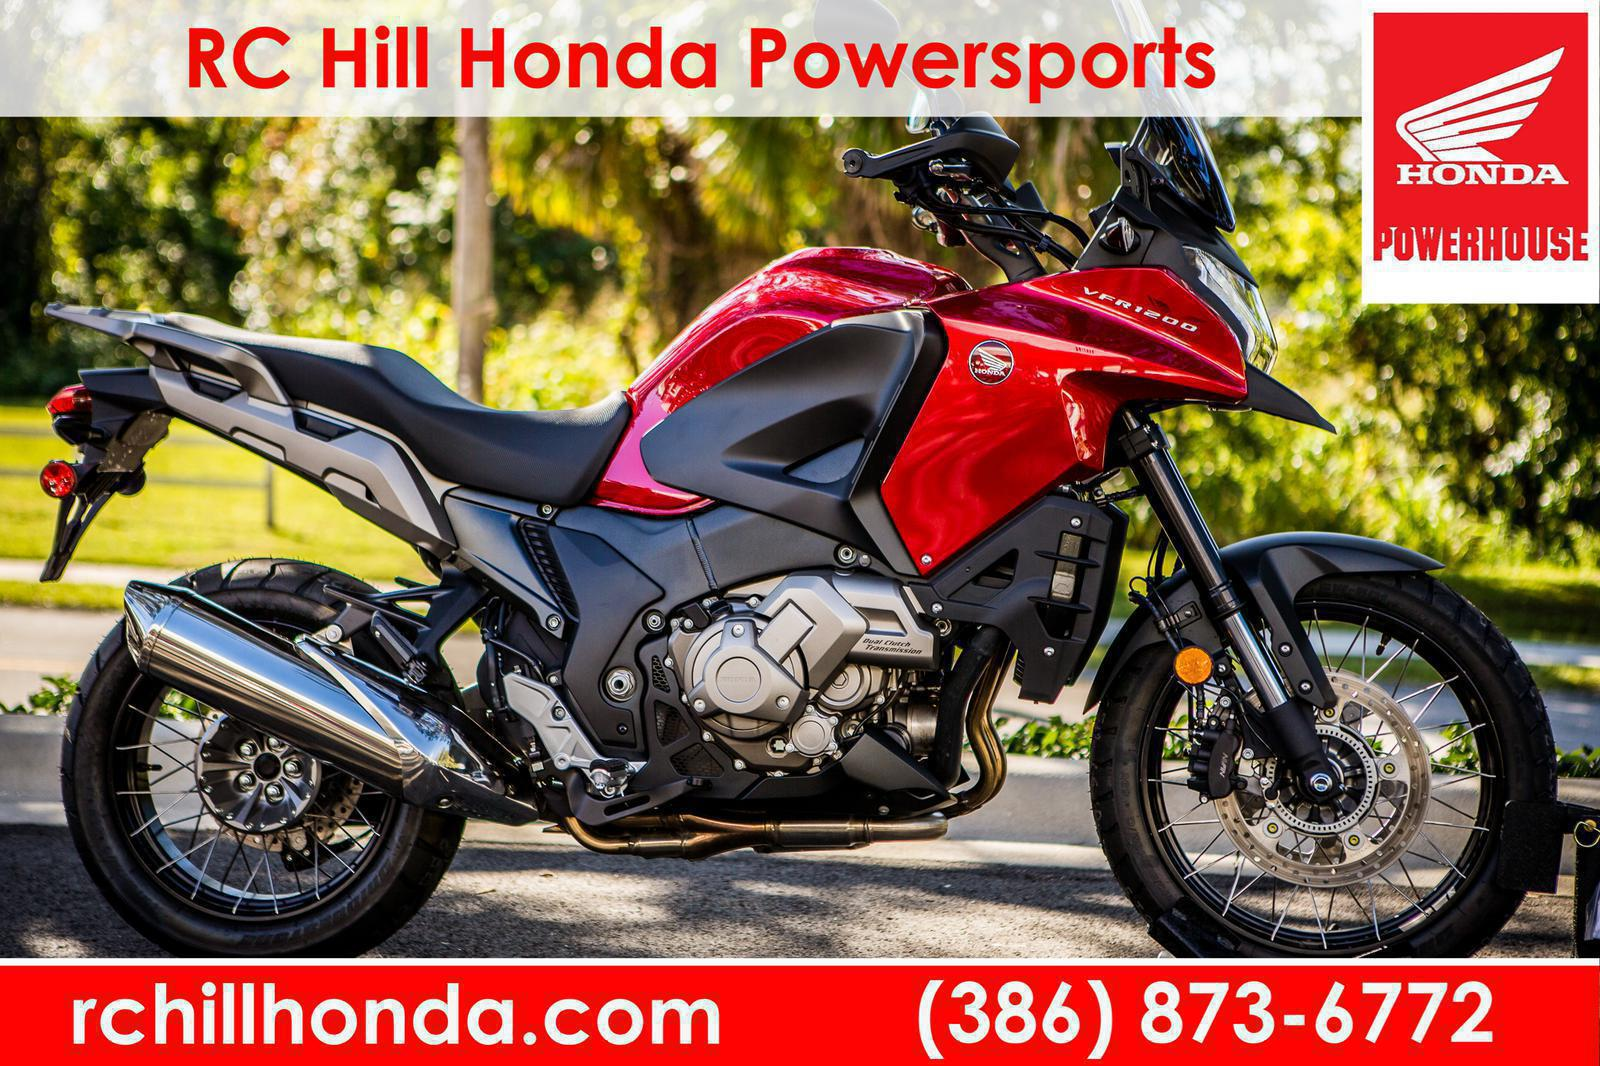 2017 Inventory from Honda RC Hill Honda Powersports DeLand